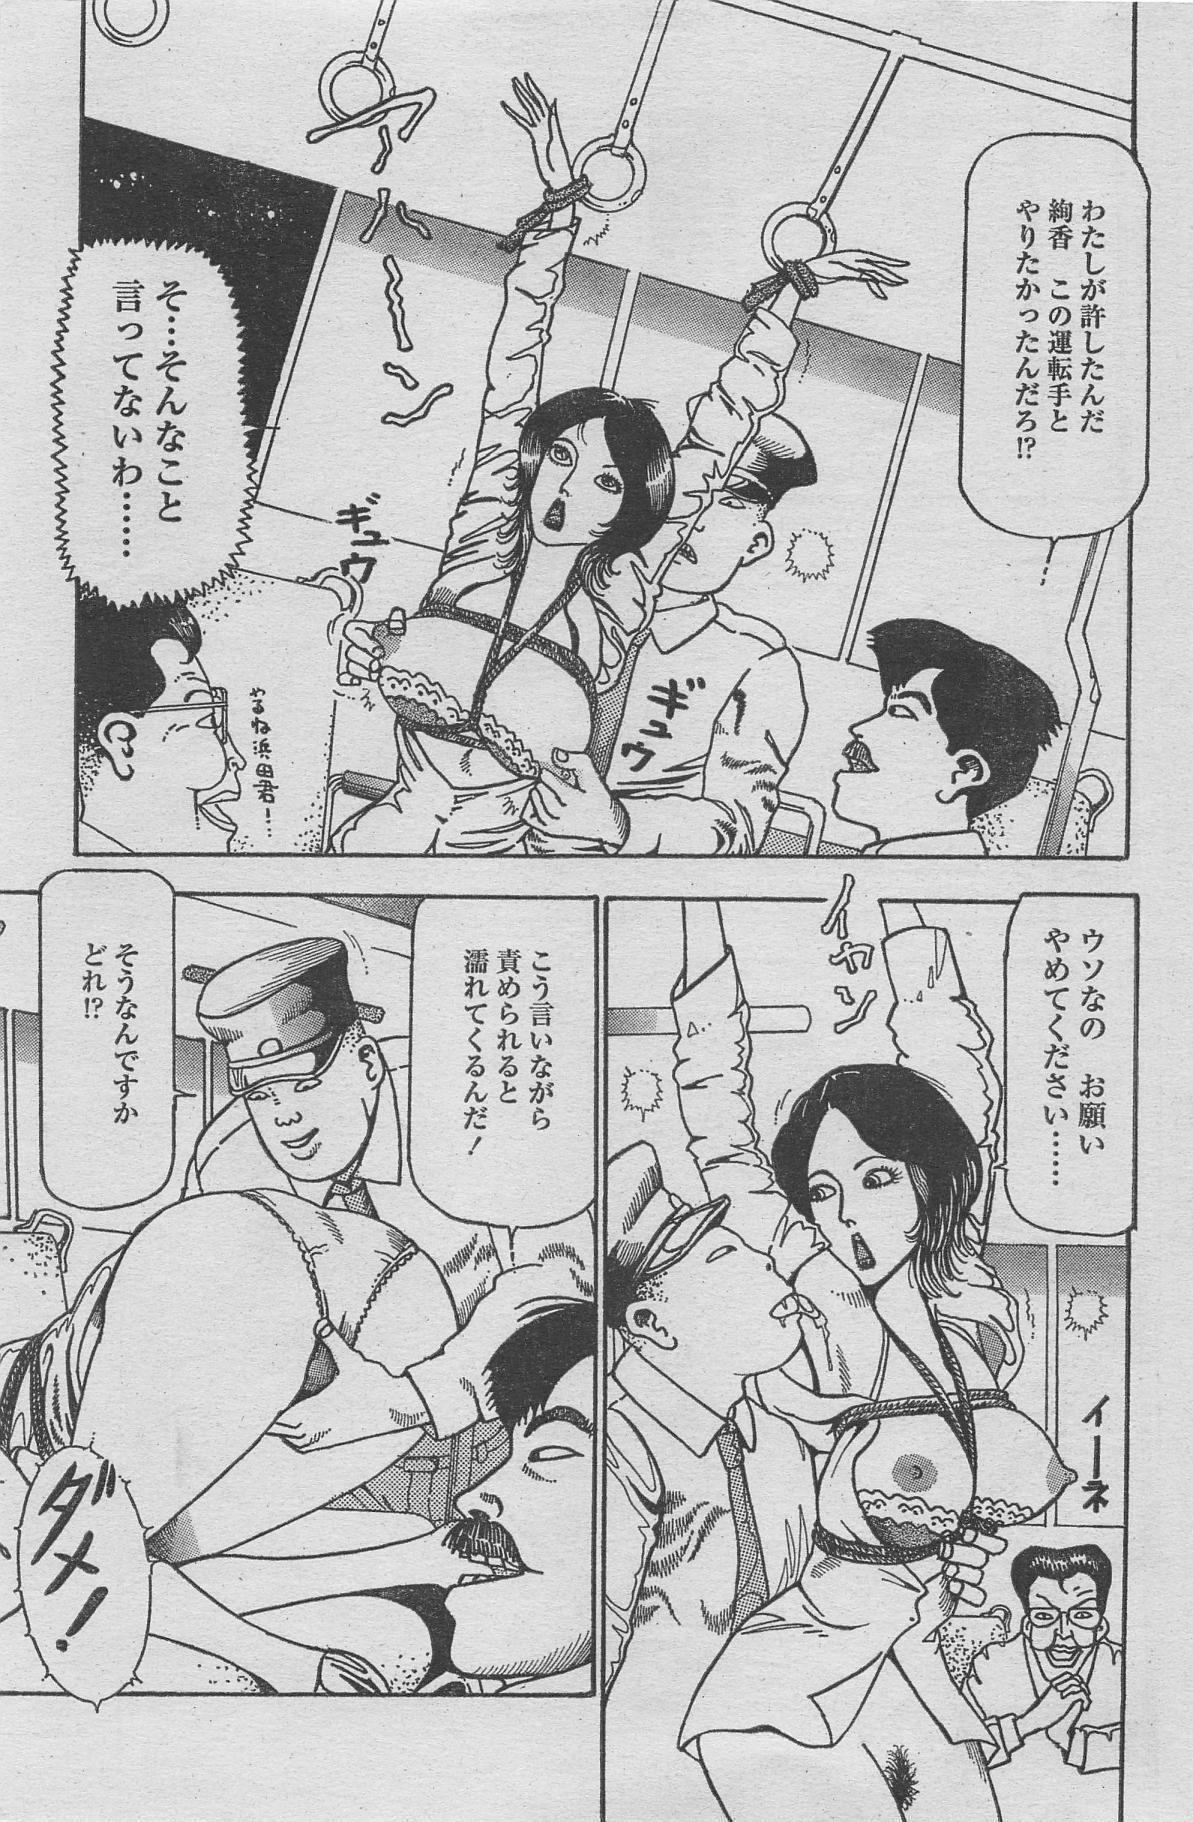 Manga Lawrence 2013-04 136